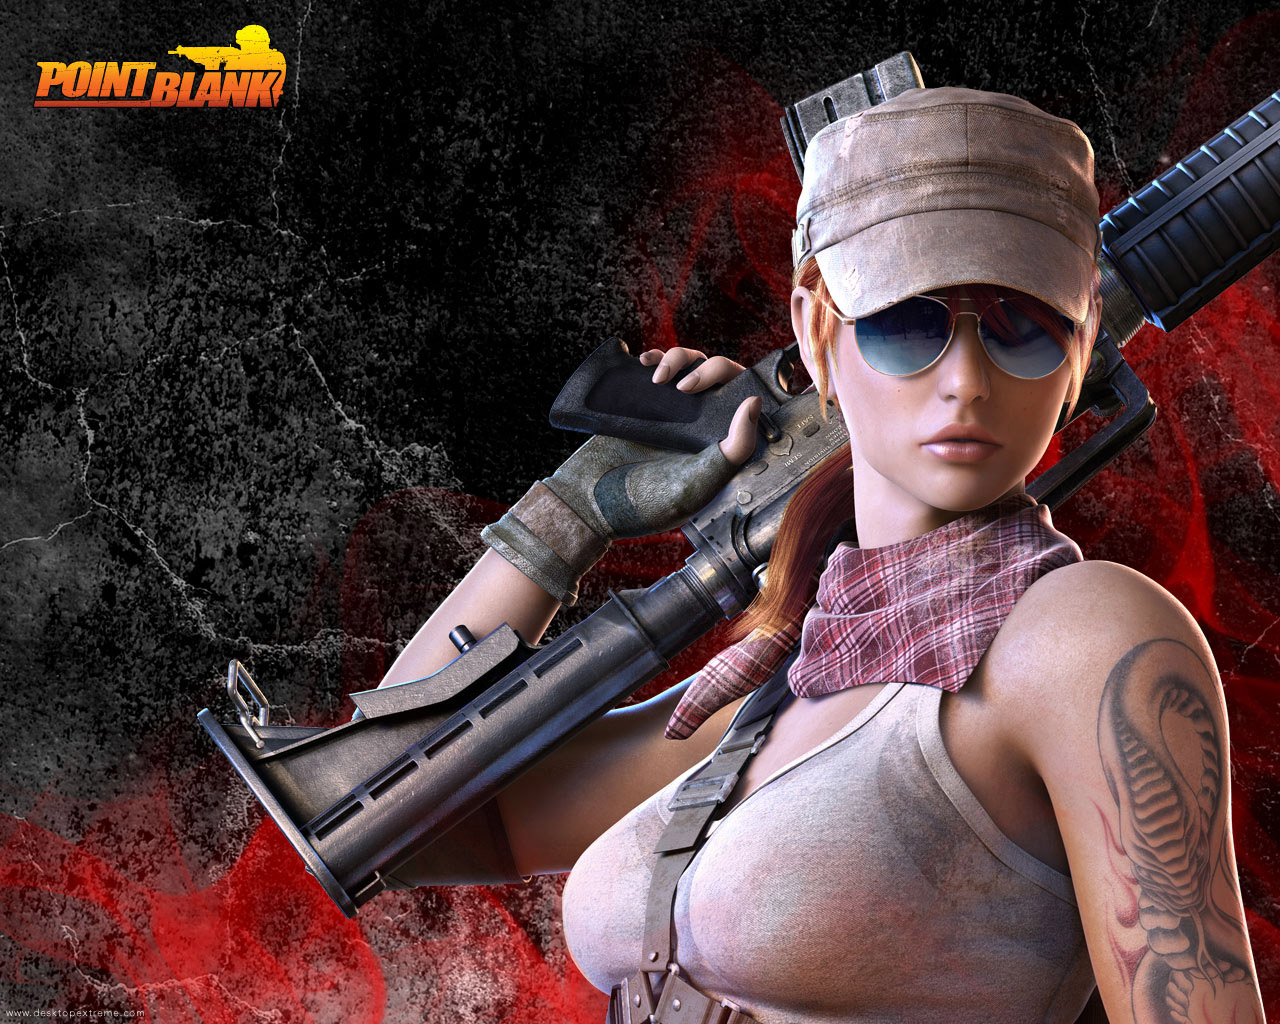 http://4.bp.blogspot.com/-2lWZL1m7B-4/TeL1ahQoeII/AAAAAAAAAG8/cgXjC6BZ25Q/s1600/Point_Blank_1219201051150PM527.jpg